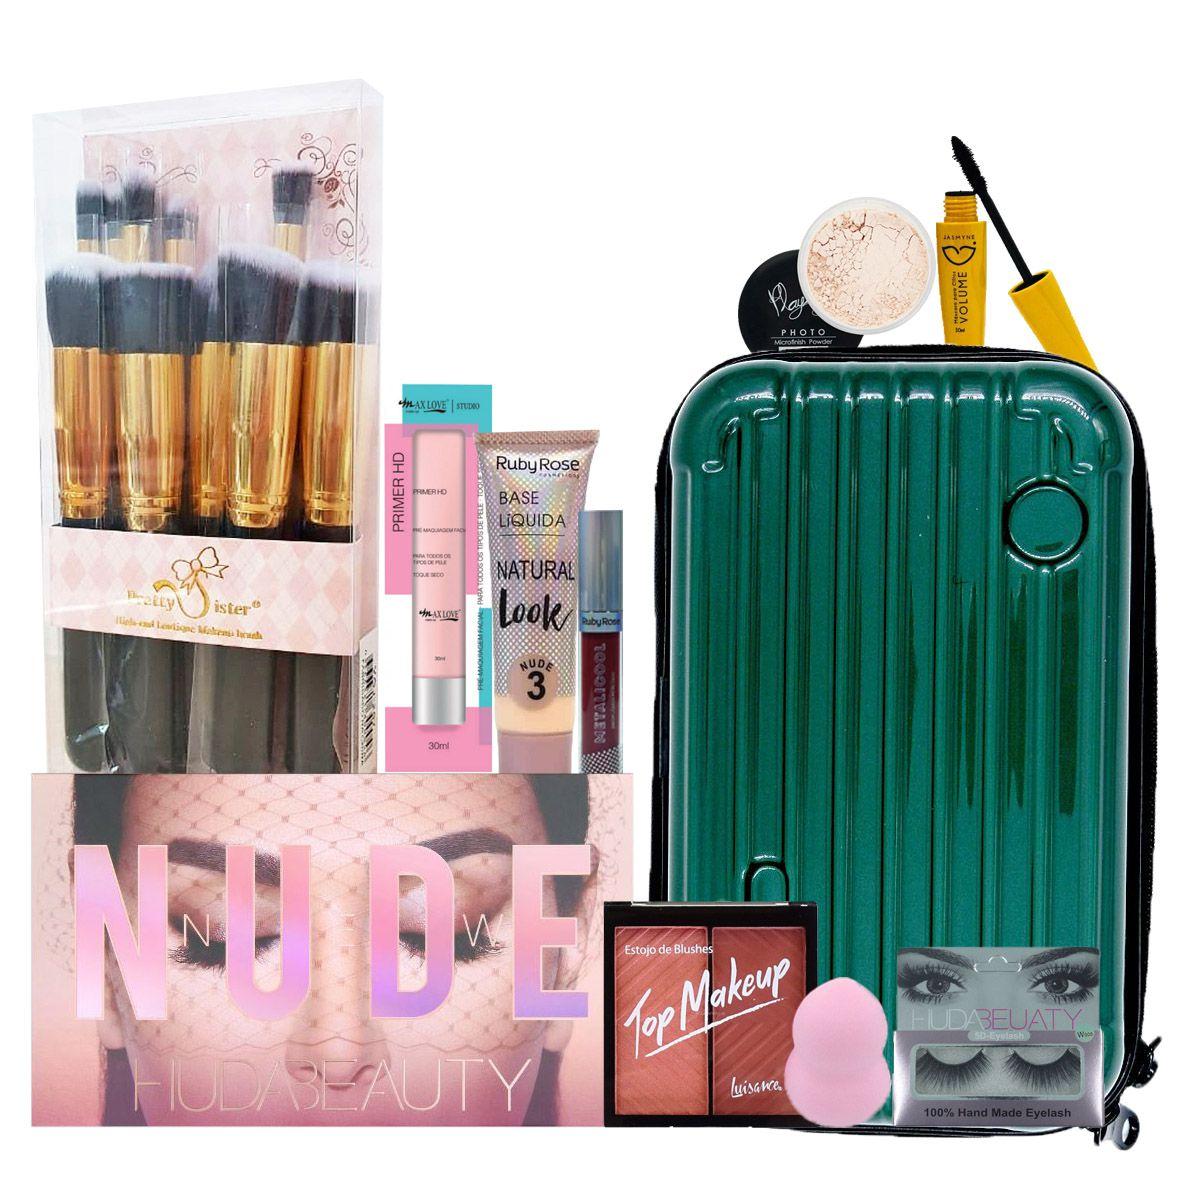 Kit De Maquiagem Paleta Nude Huda Beauty C/ BRINDE batom e necessaire de fibra